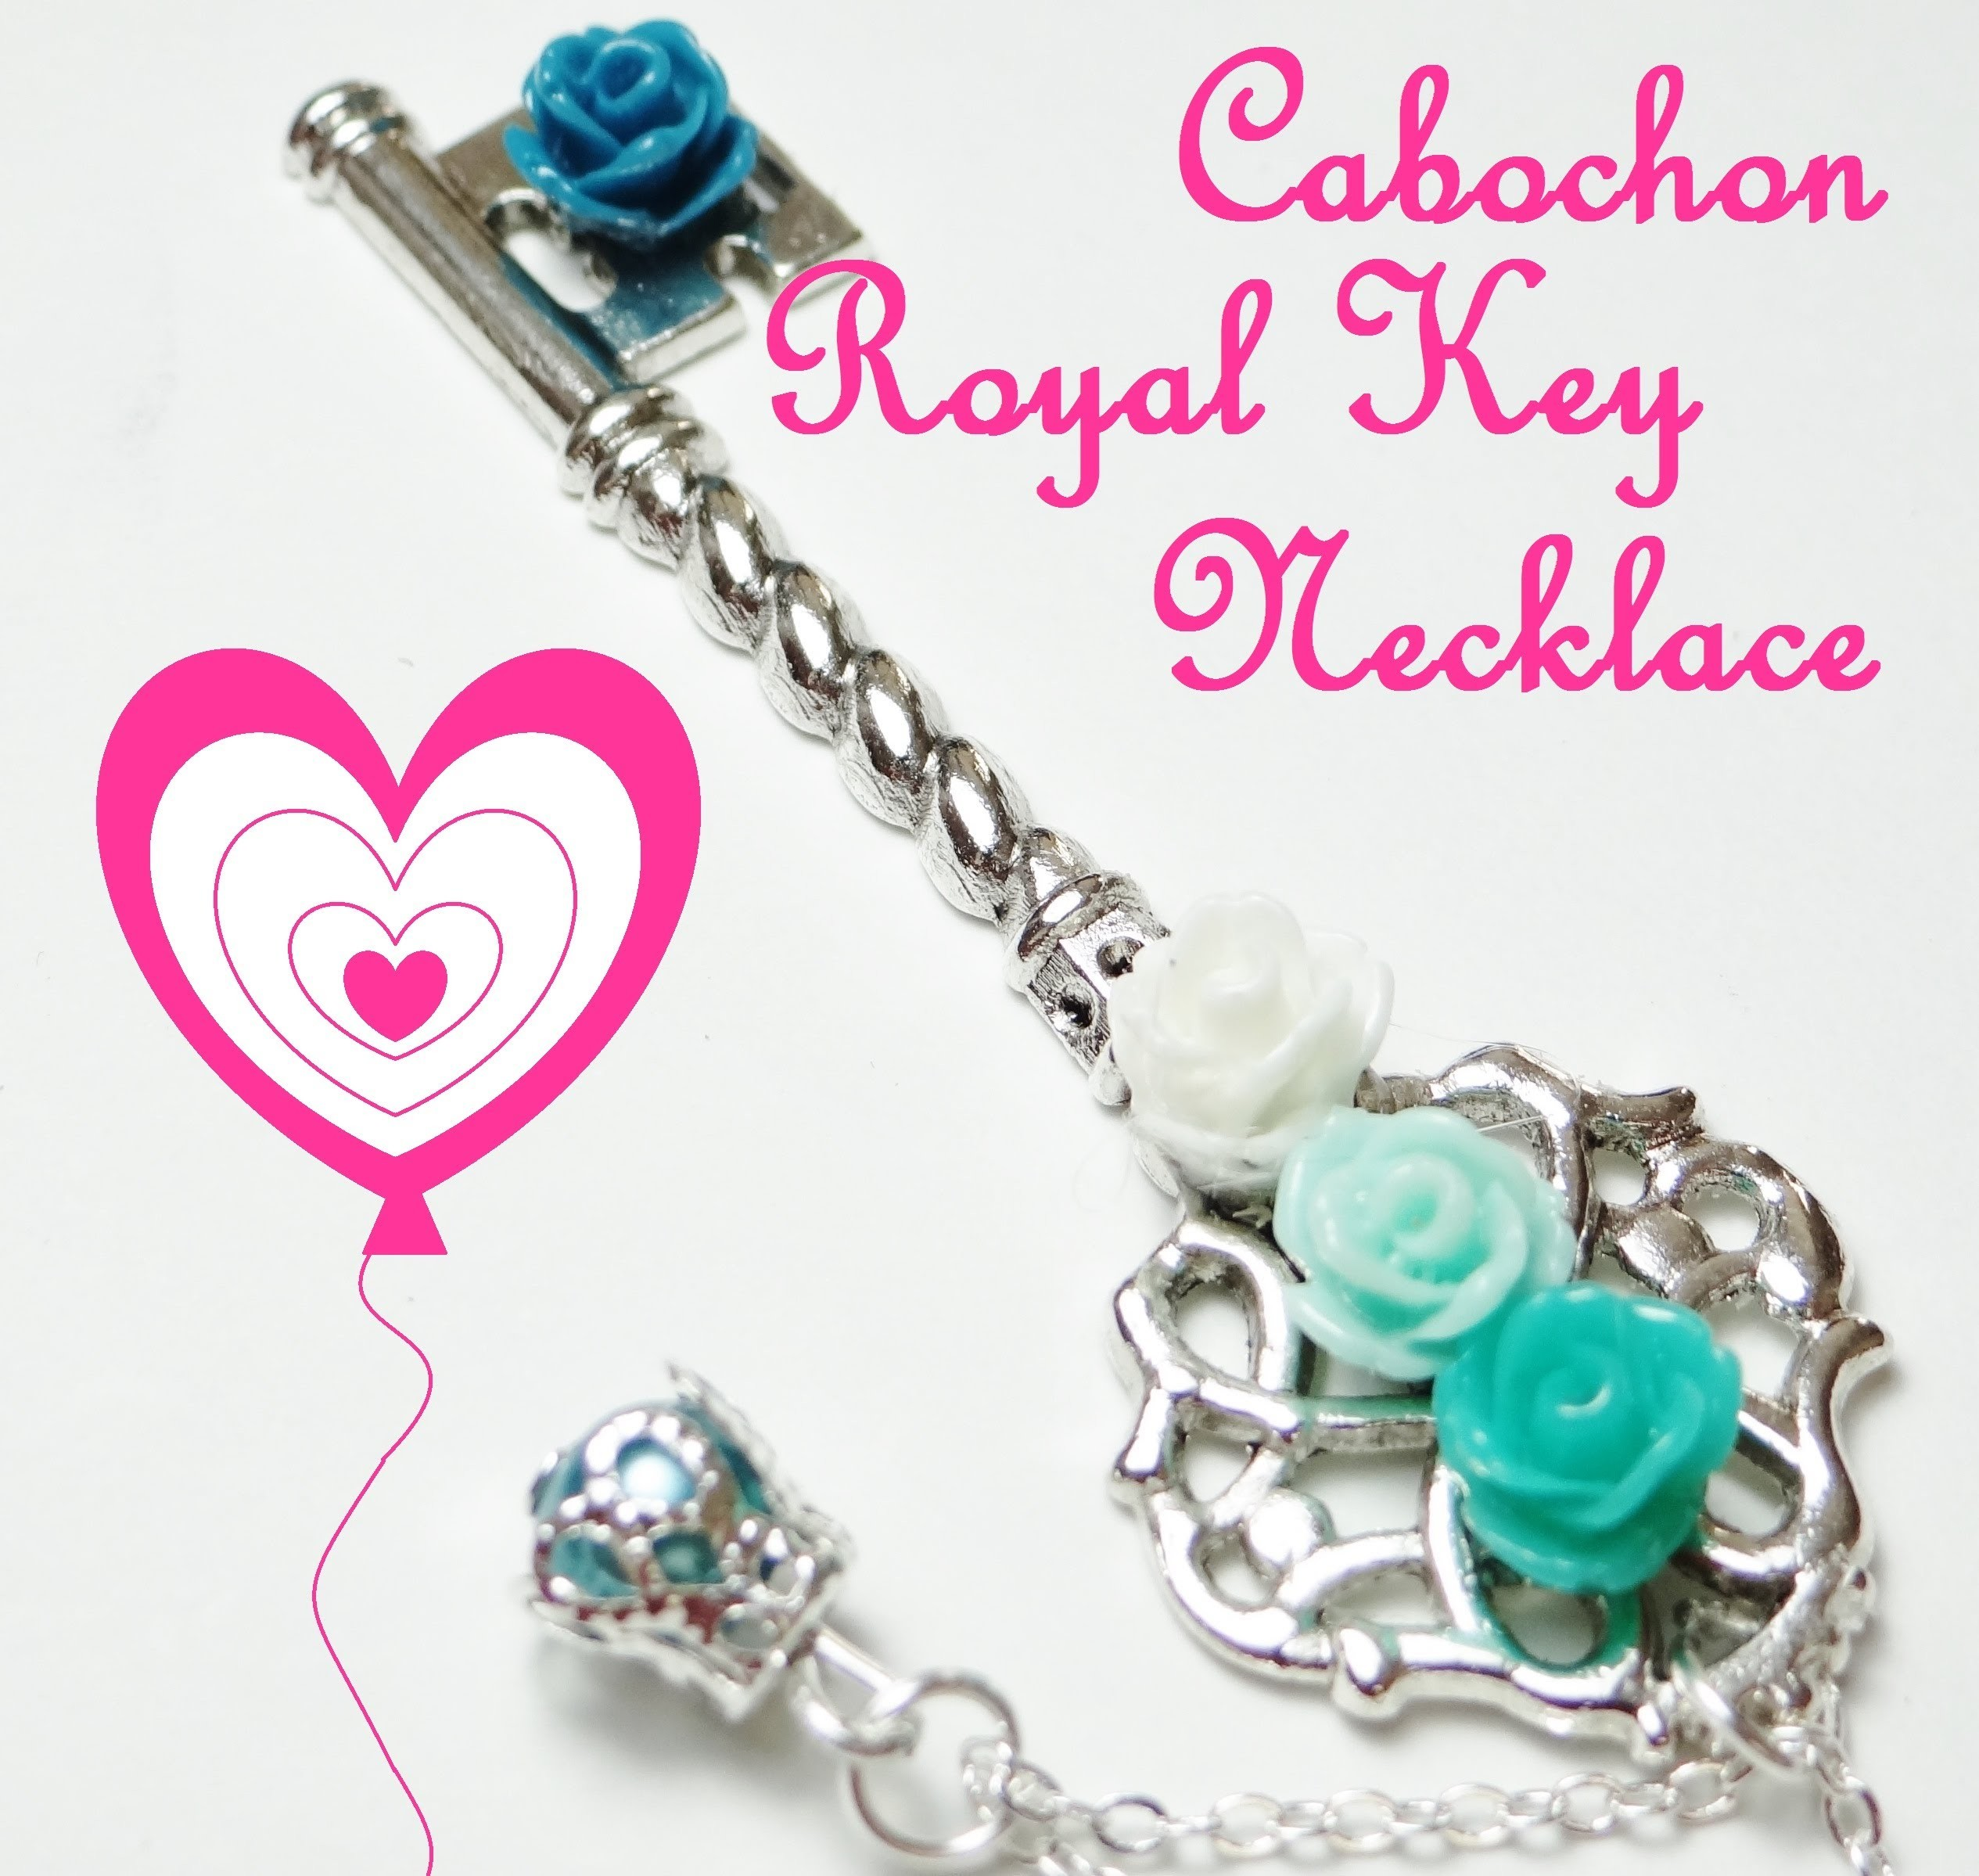 How To DIY - Cabochon Royal Key Necklace Tutorial